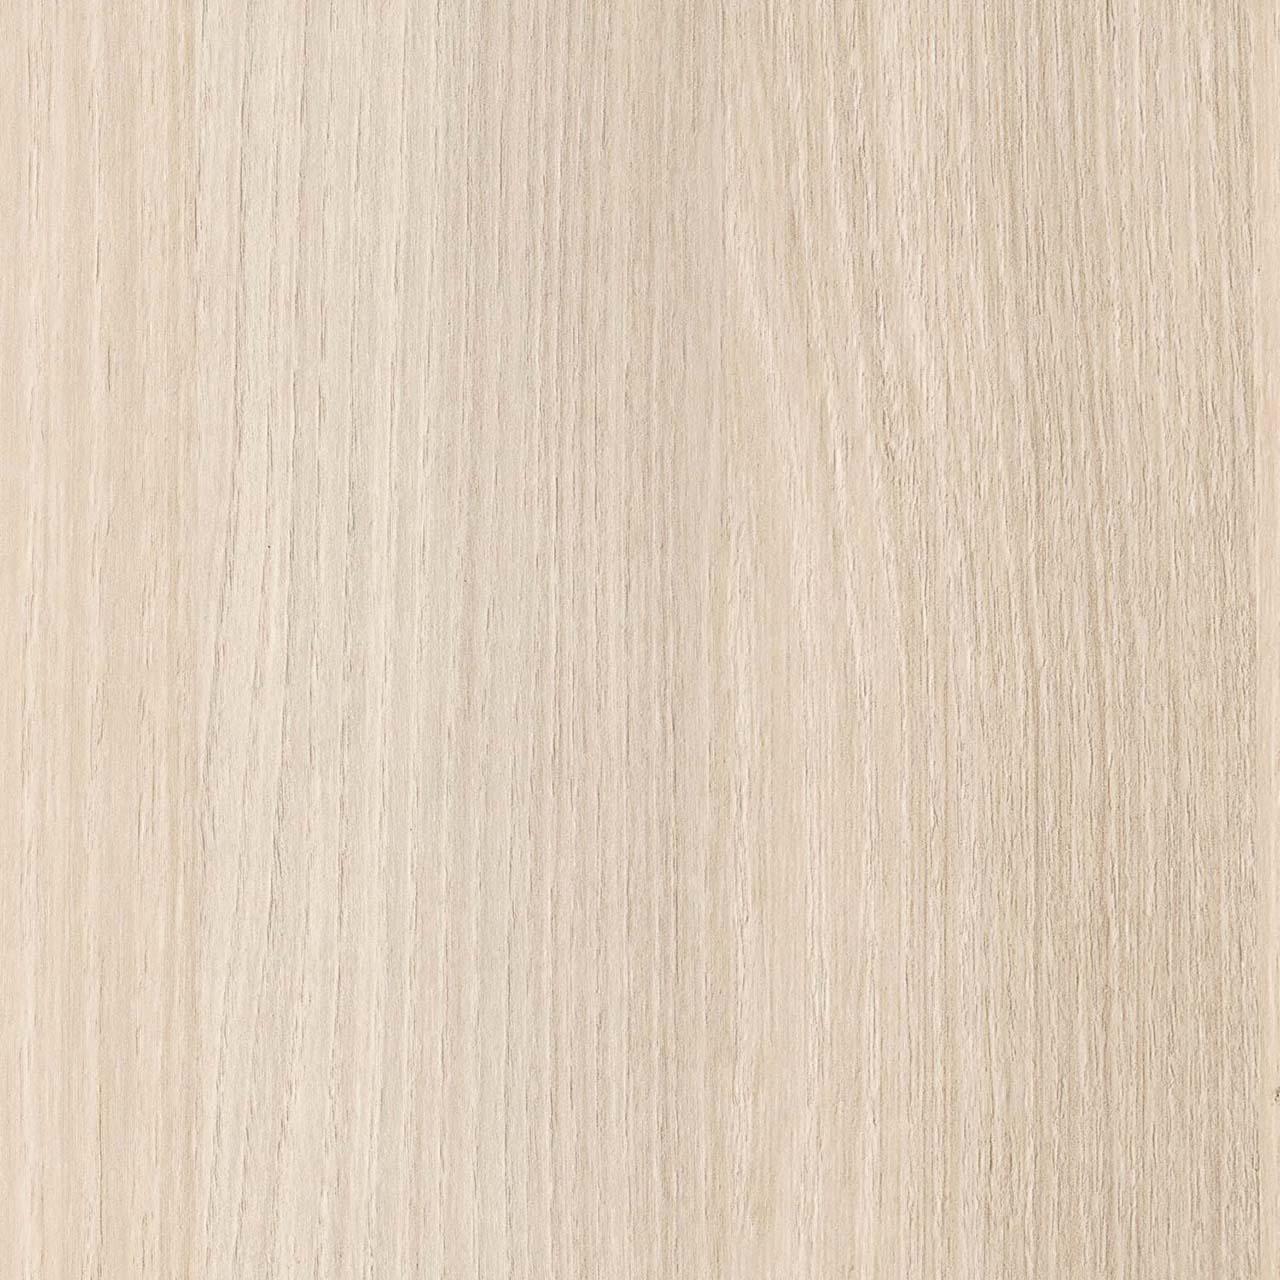 Moldau Oak effect laminate panel